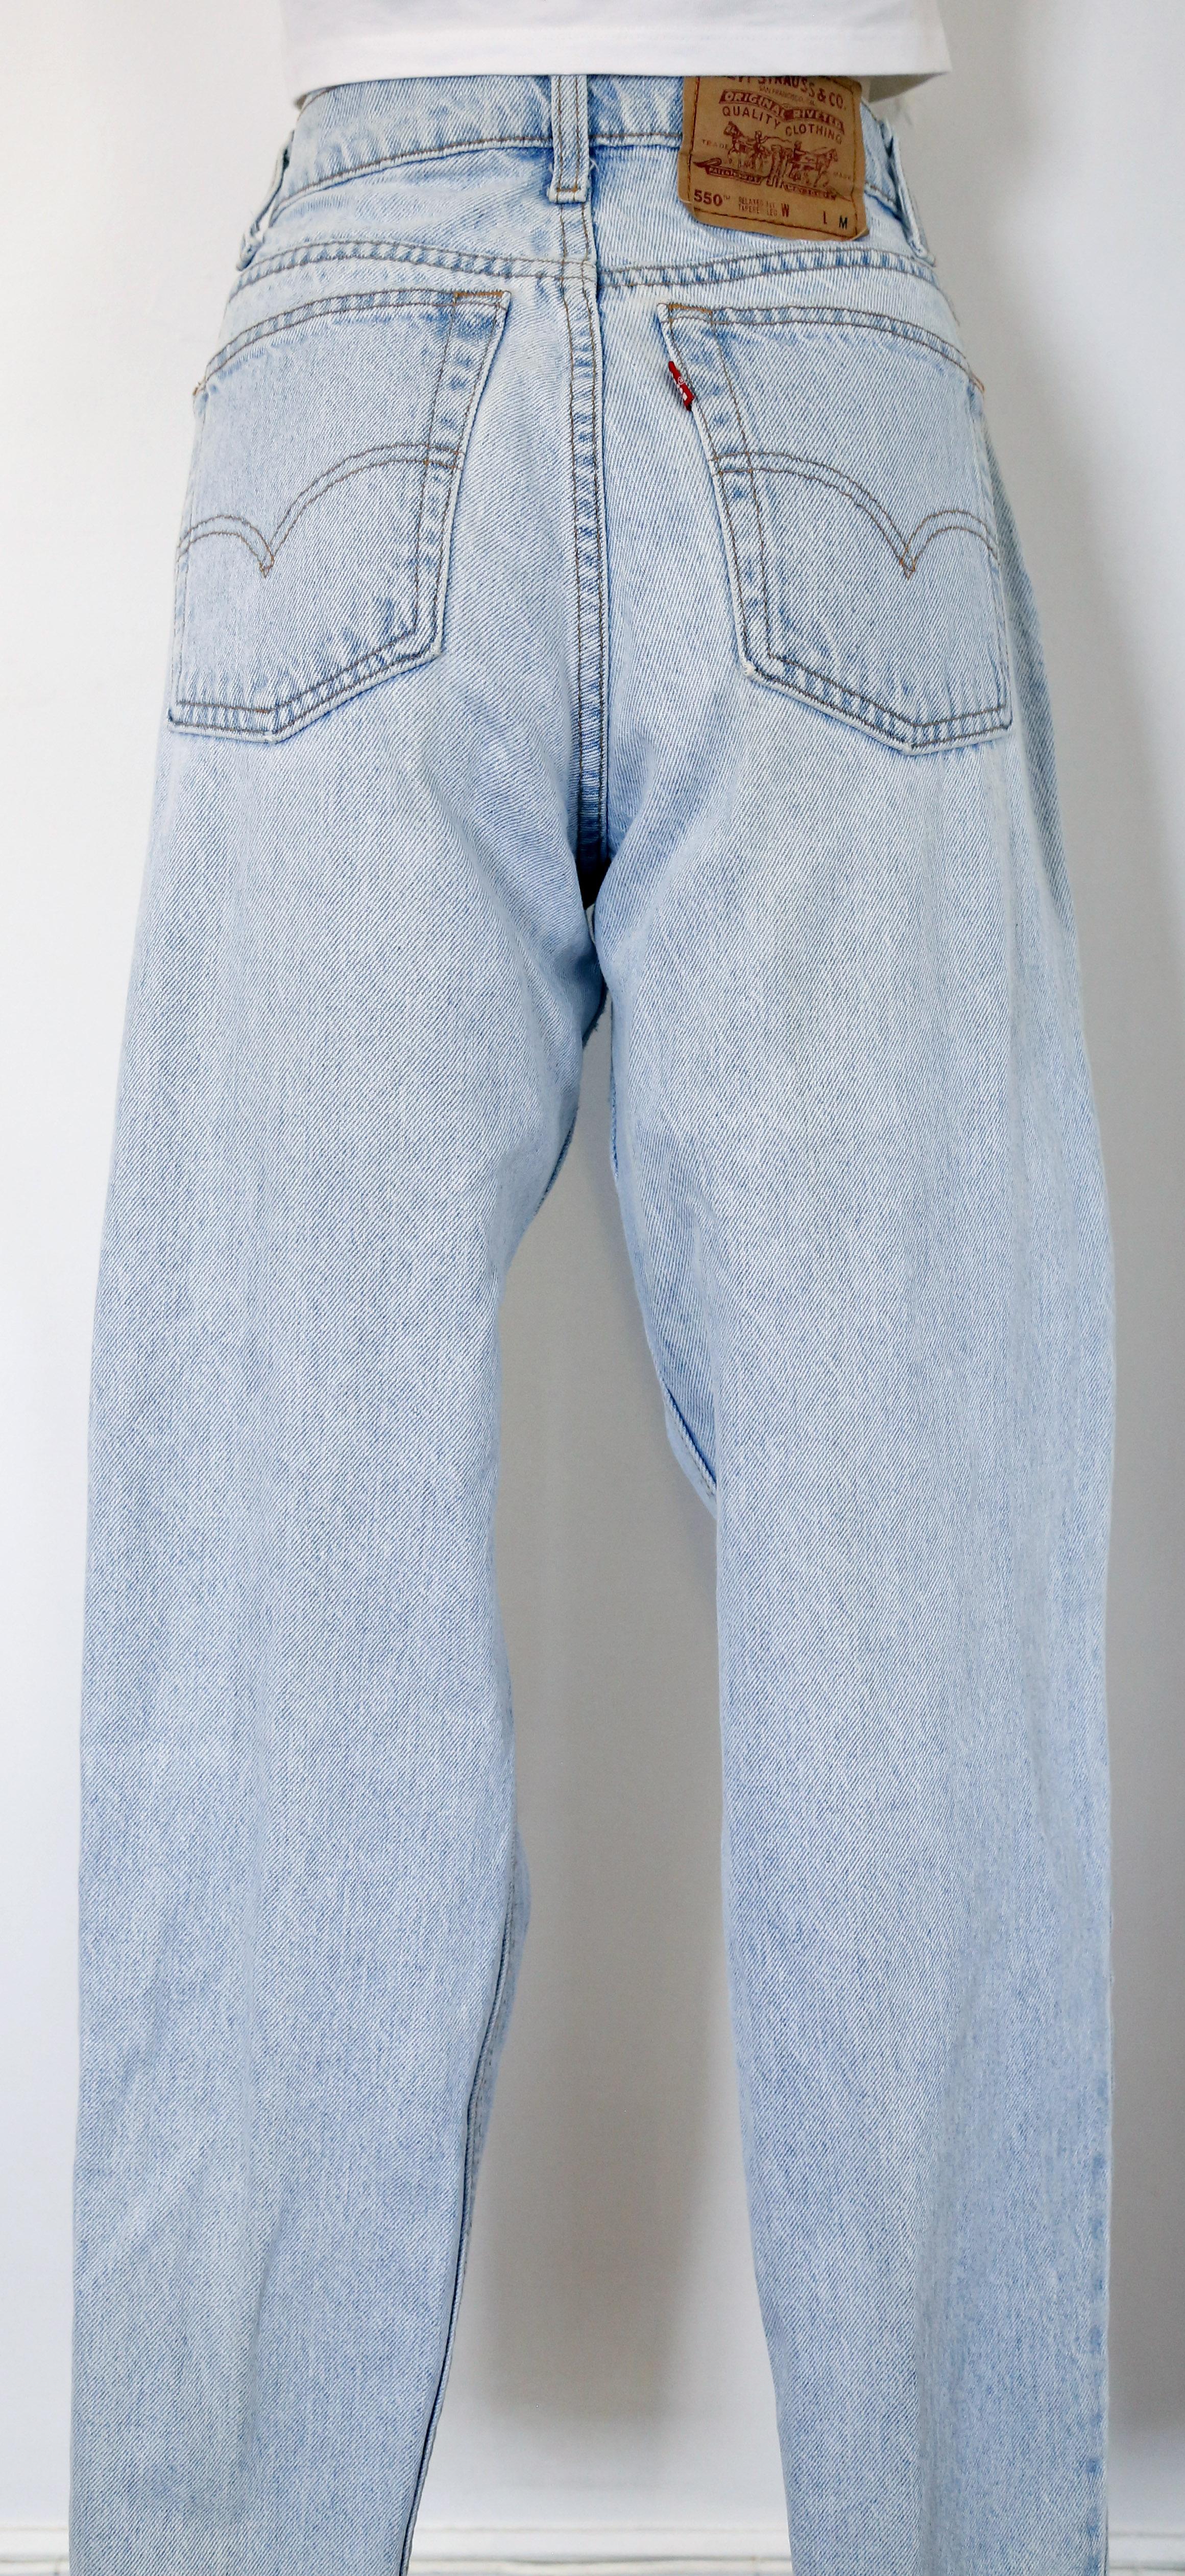 a6eebfbba5b Vintage Levi High-waist Jeans (Size 9) · mod maya · Online Store ...